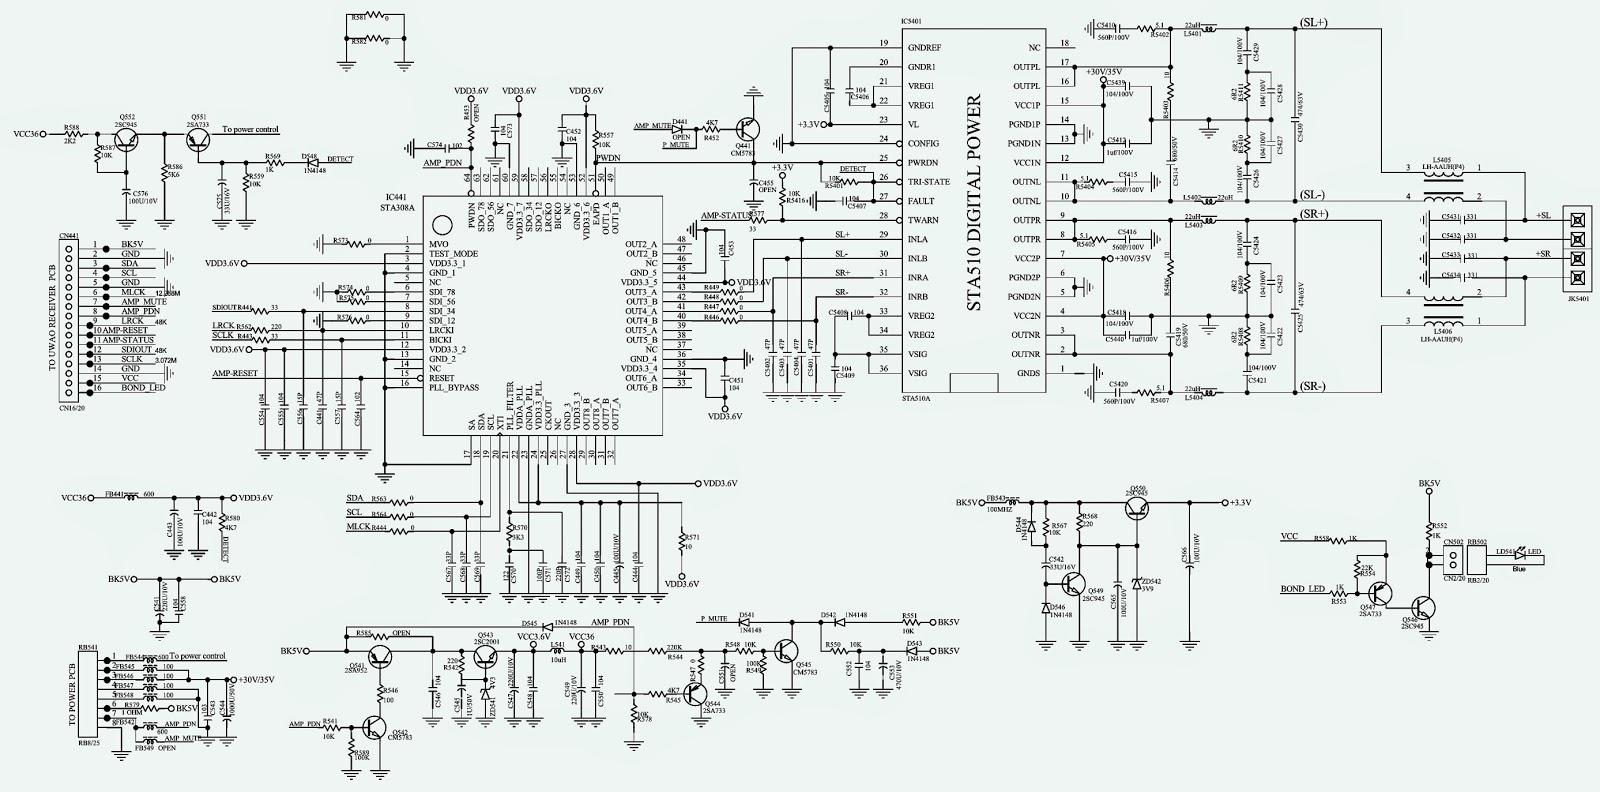 Philips Hts3548w Power Supply Schematic Circuit Diagram